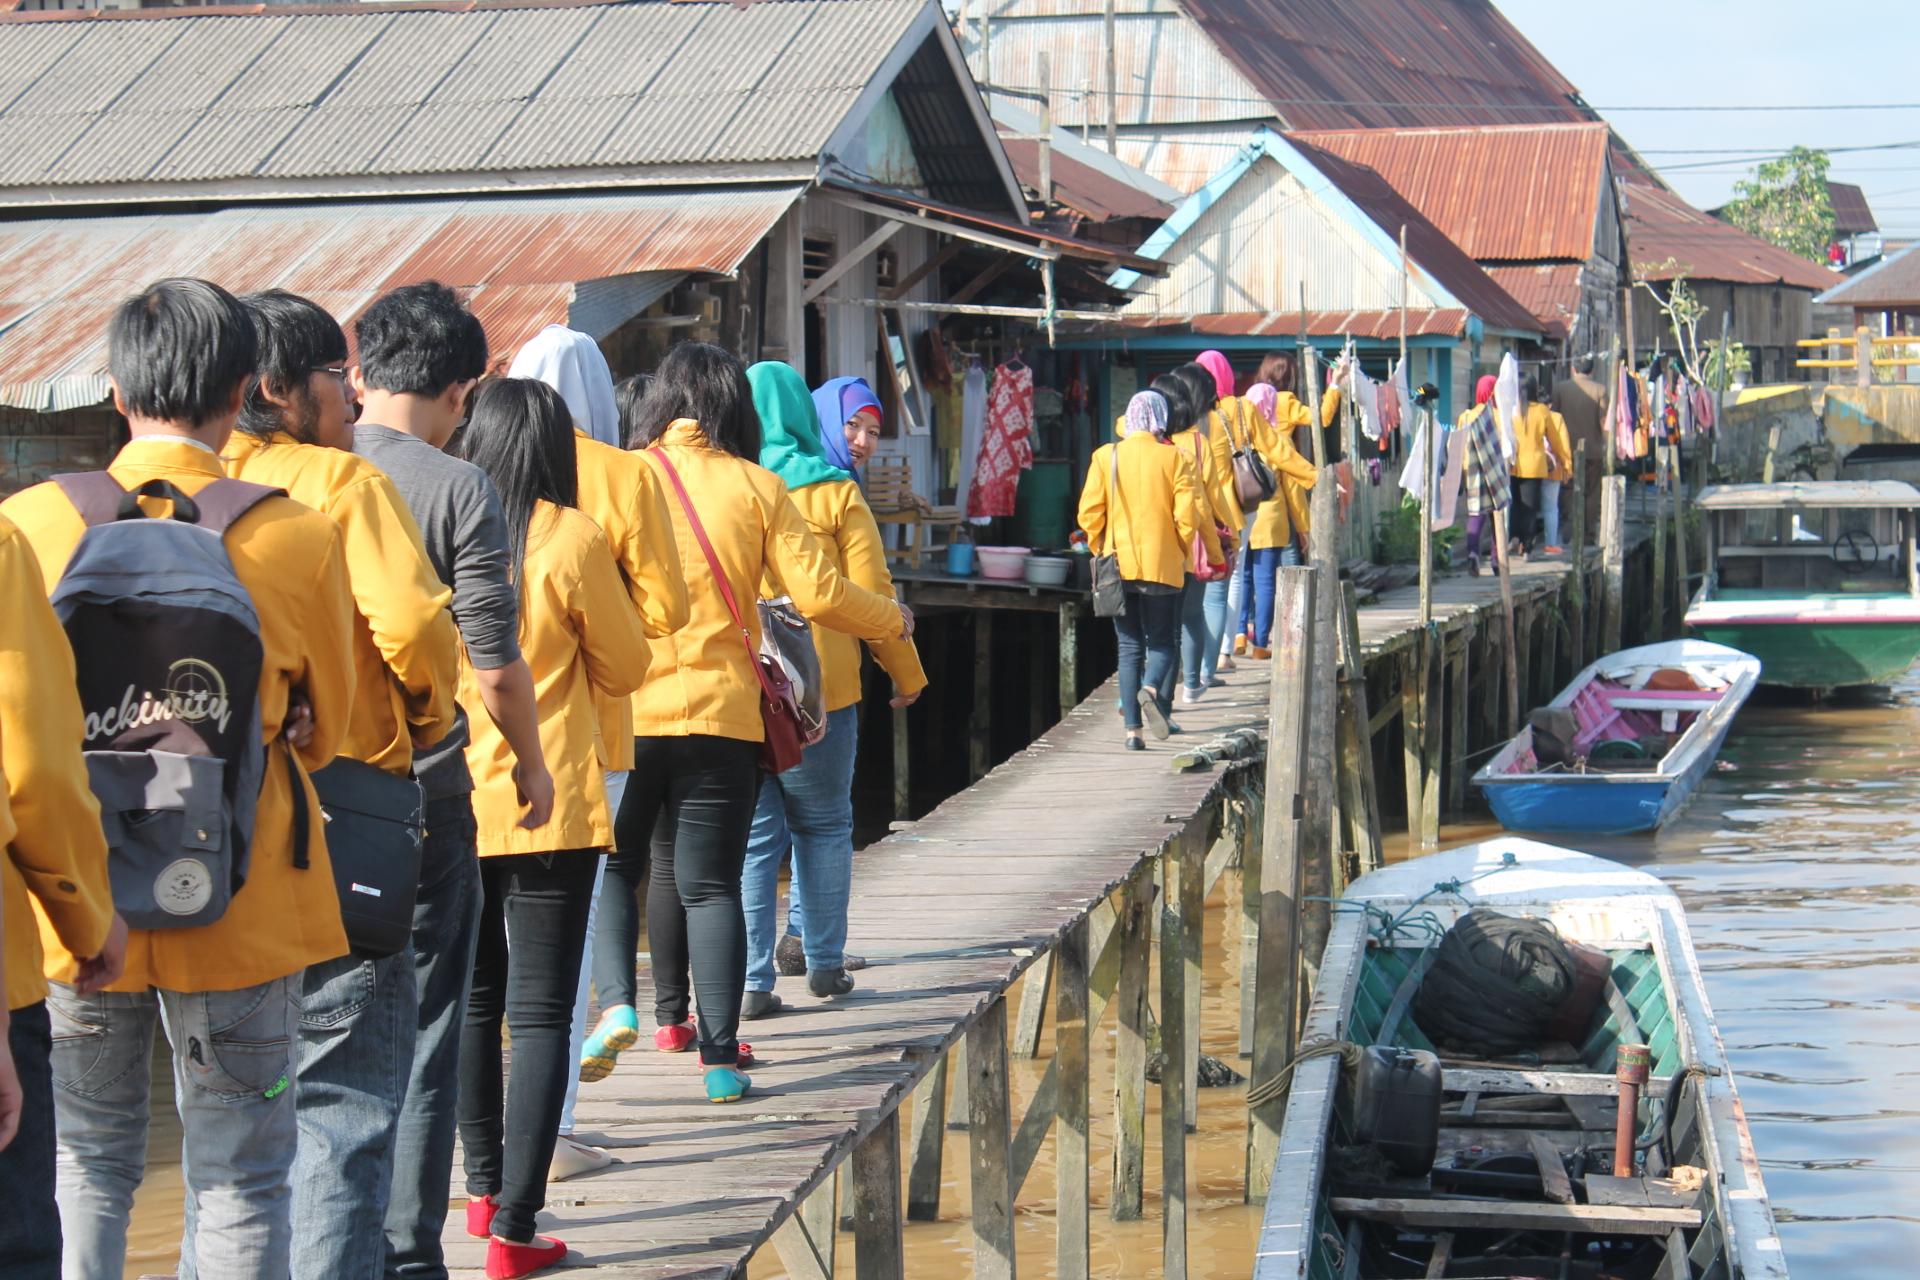 Kampung Tenun Samarinda Seberang Ibrahim Nim 1002055100 Gambar Kota